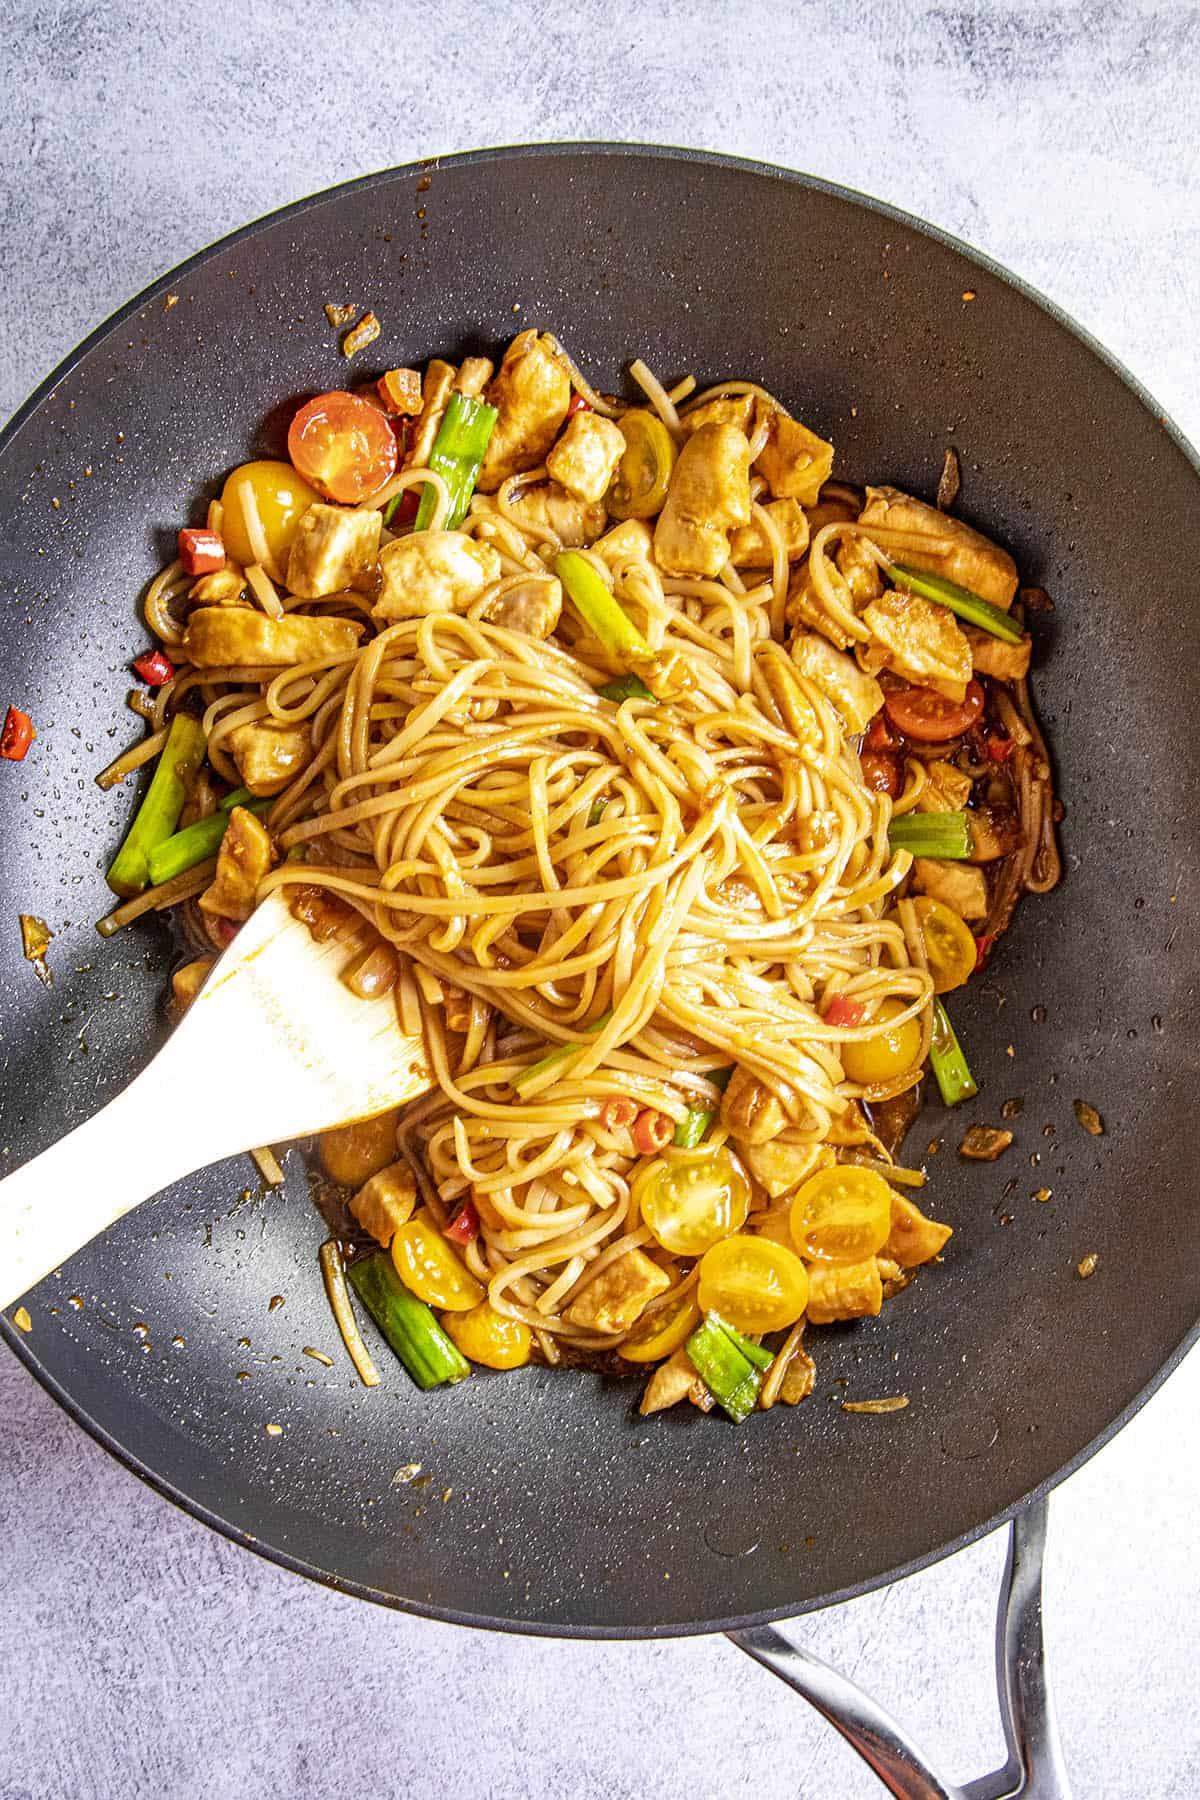 Stirring Drunken Noodles into the hot pan